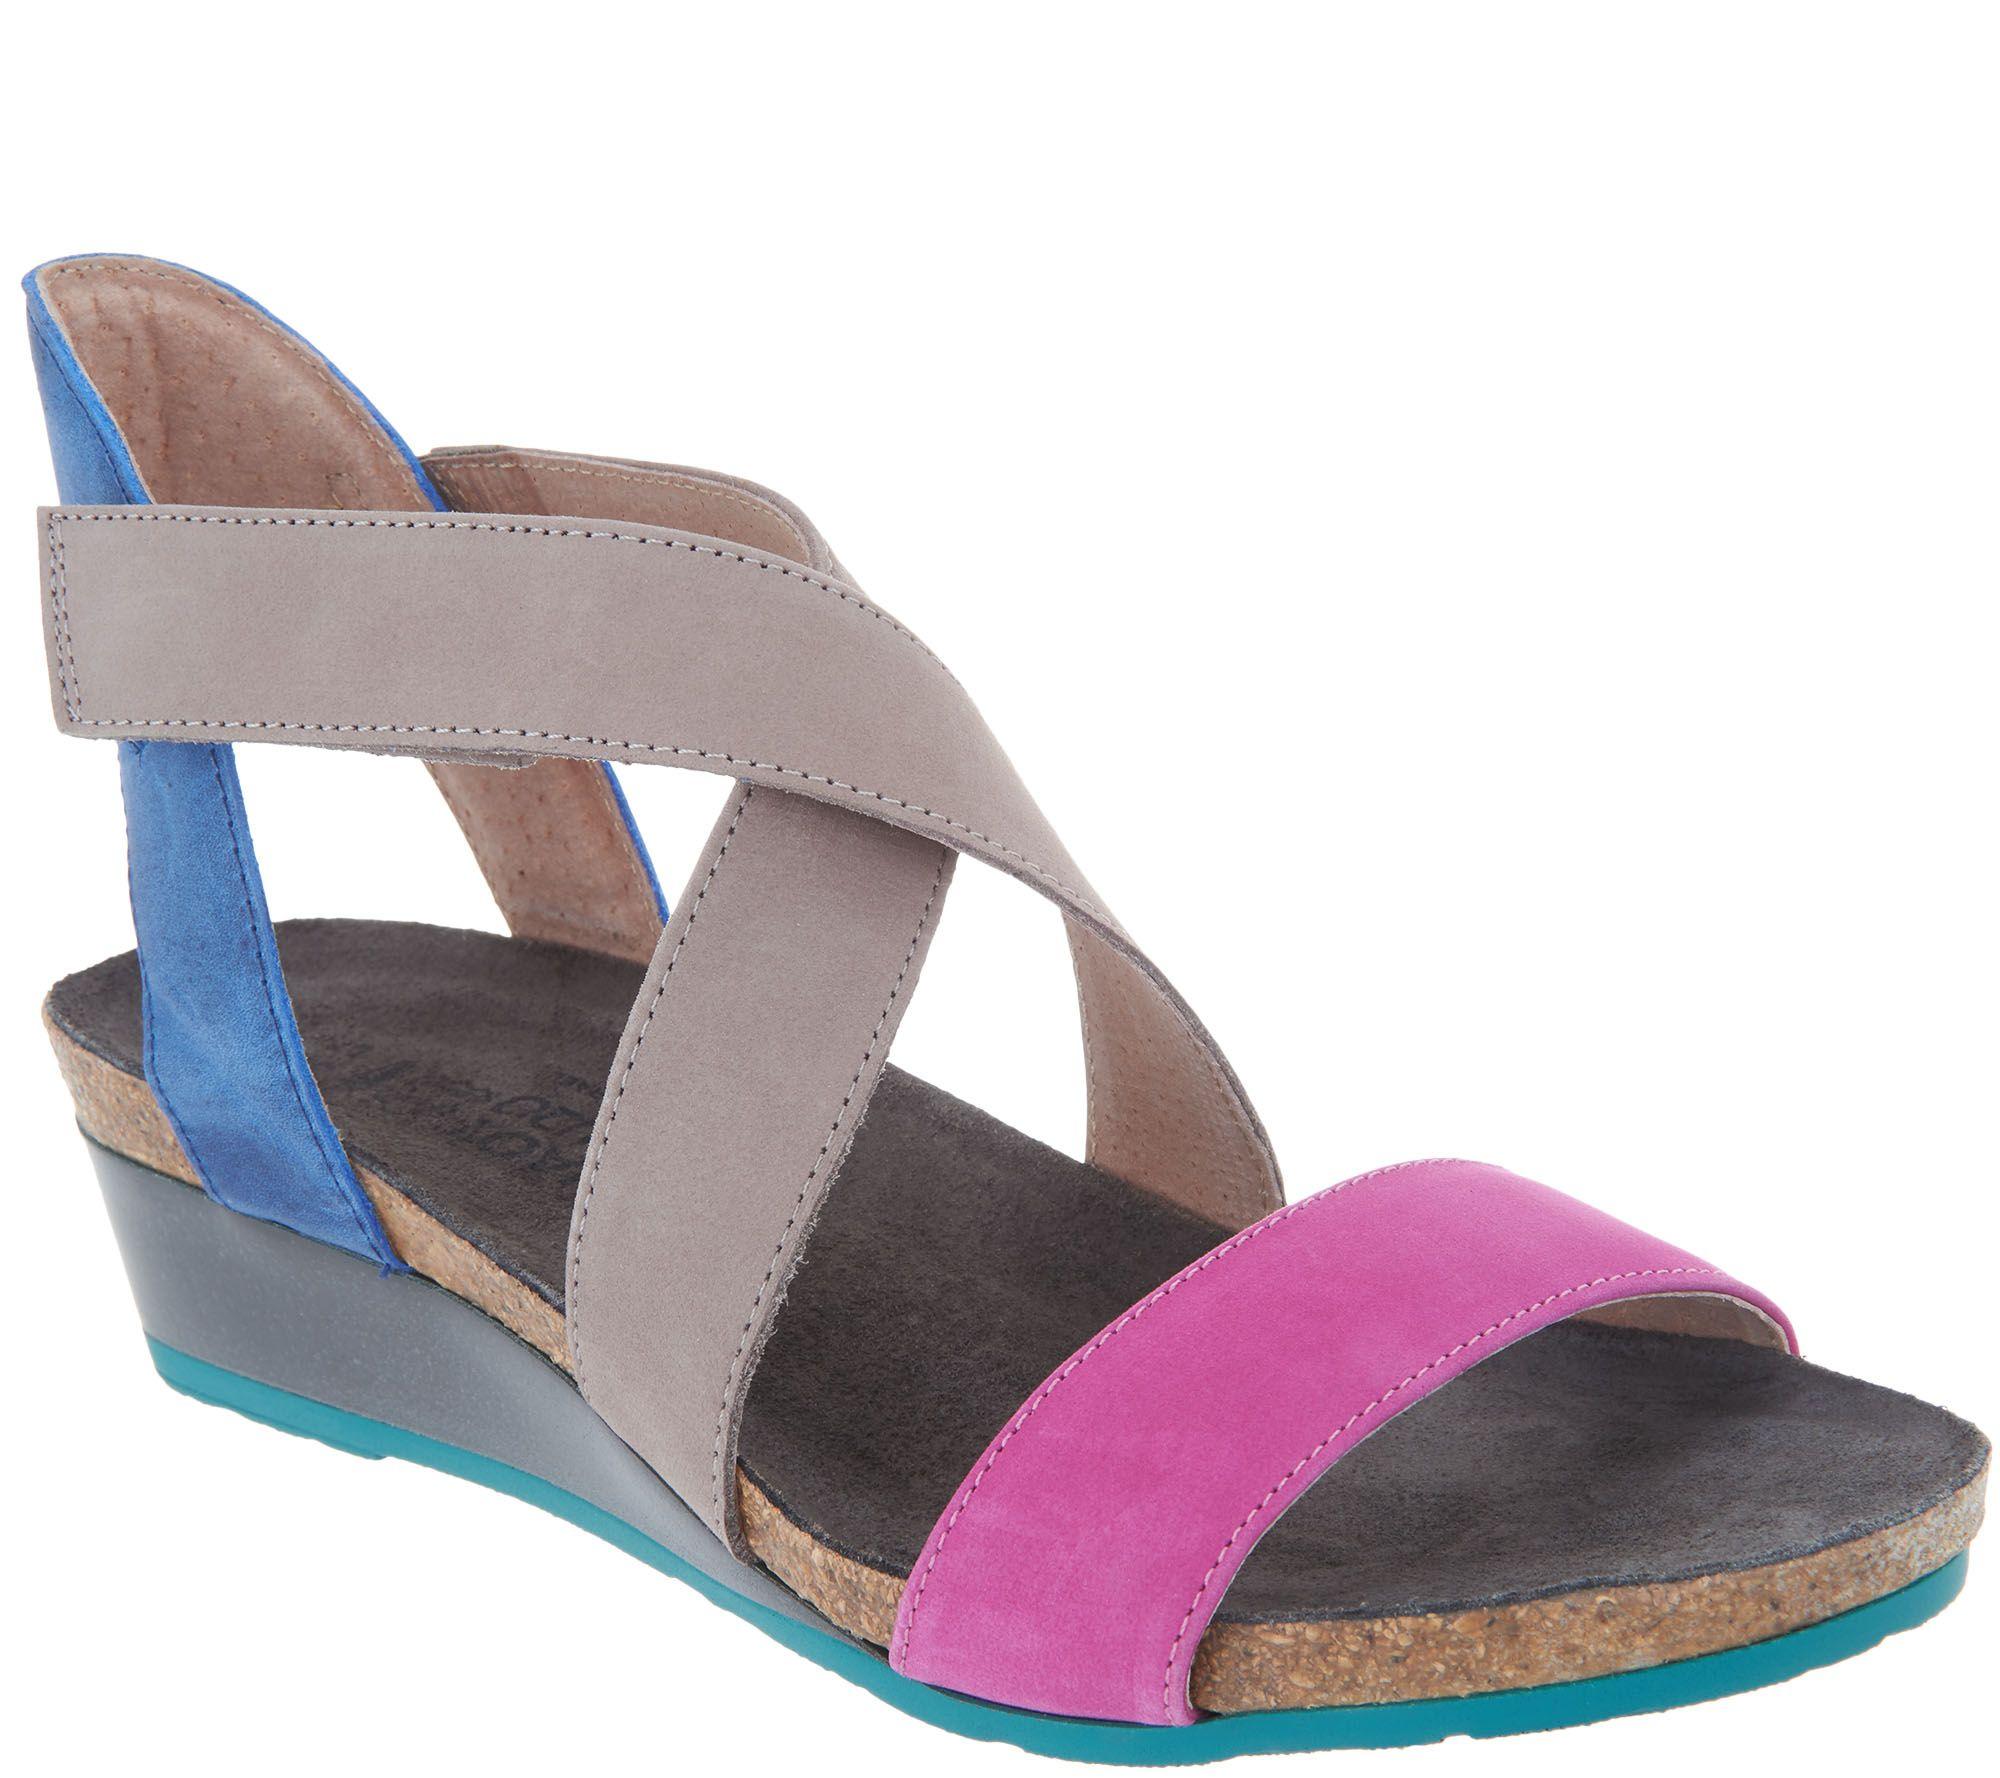 03e84056b7a Naot Leather Cross Strap Wedge Sandals - Vixen - Page 1 — QVC.com